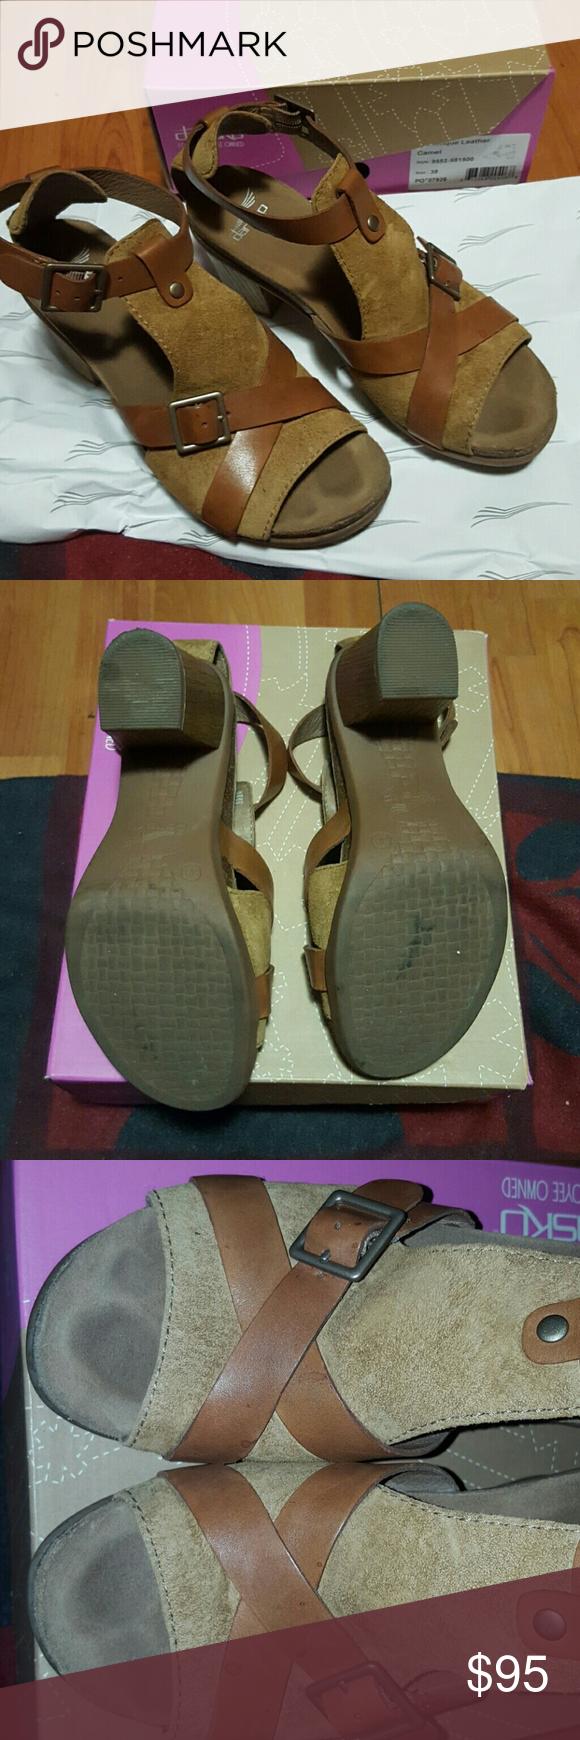 Dansko : Dominique Dansko cork comfortable sandal heals. Worn 3-4 times. Has little stains Dansko Shoes Sandals